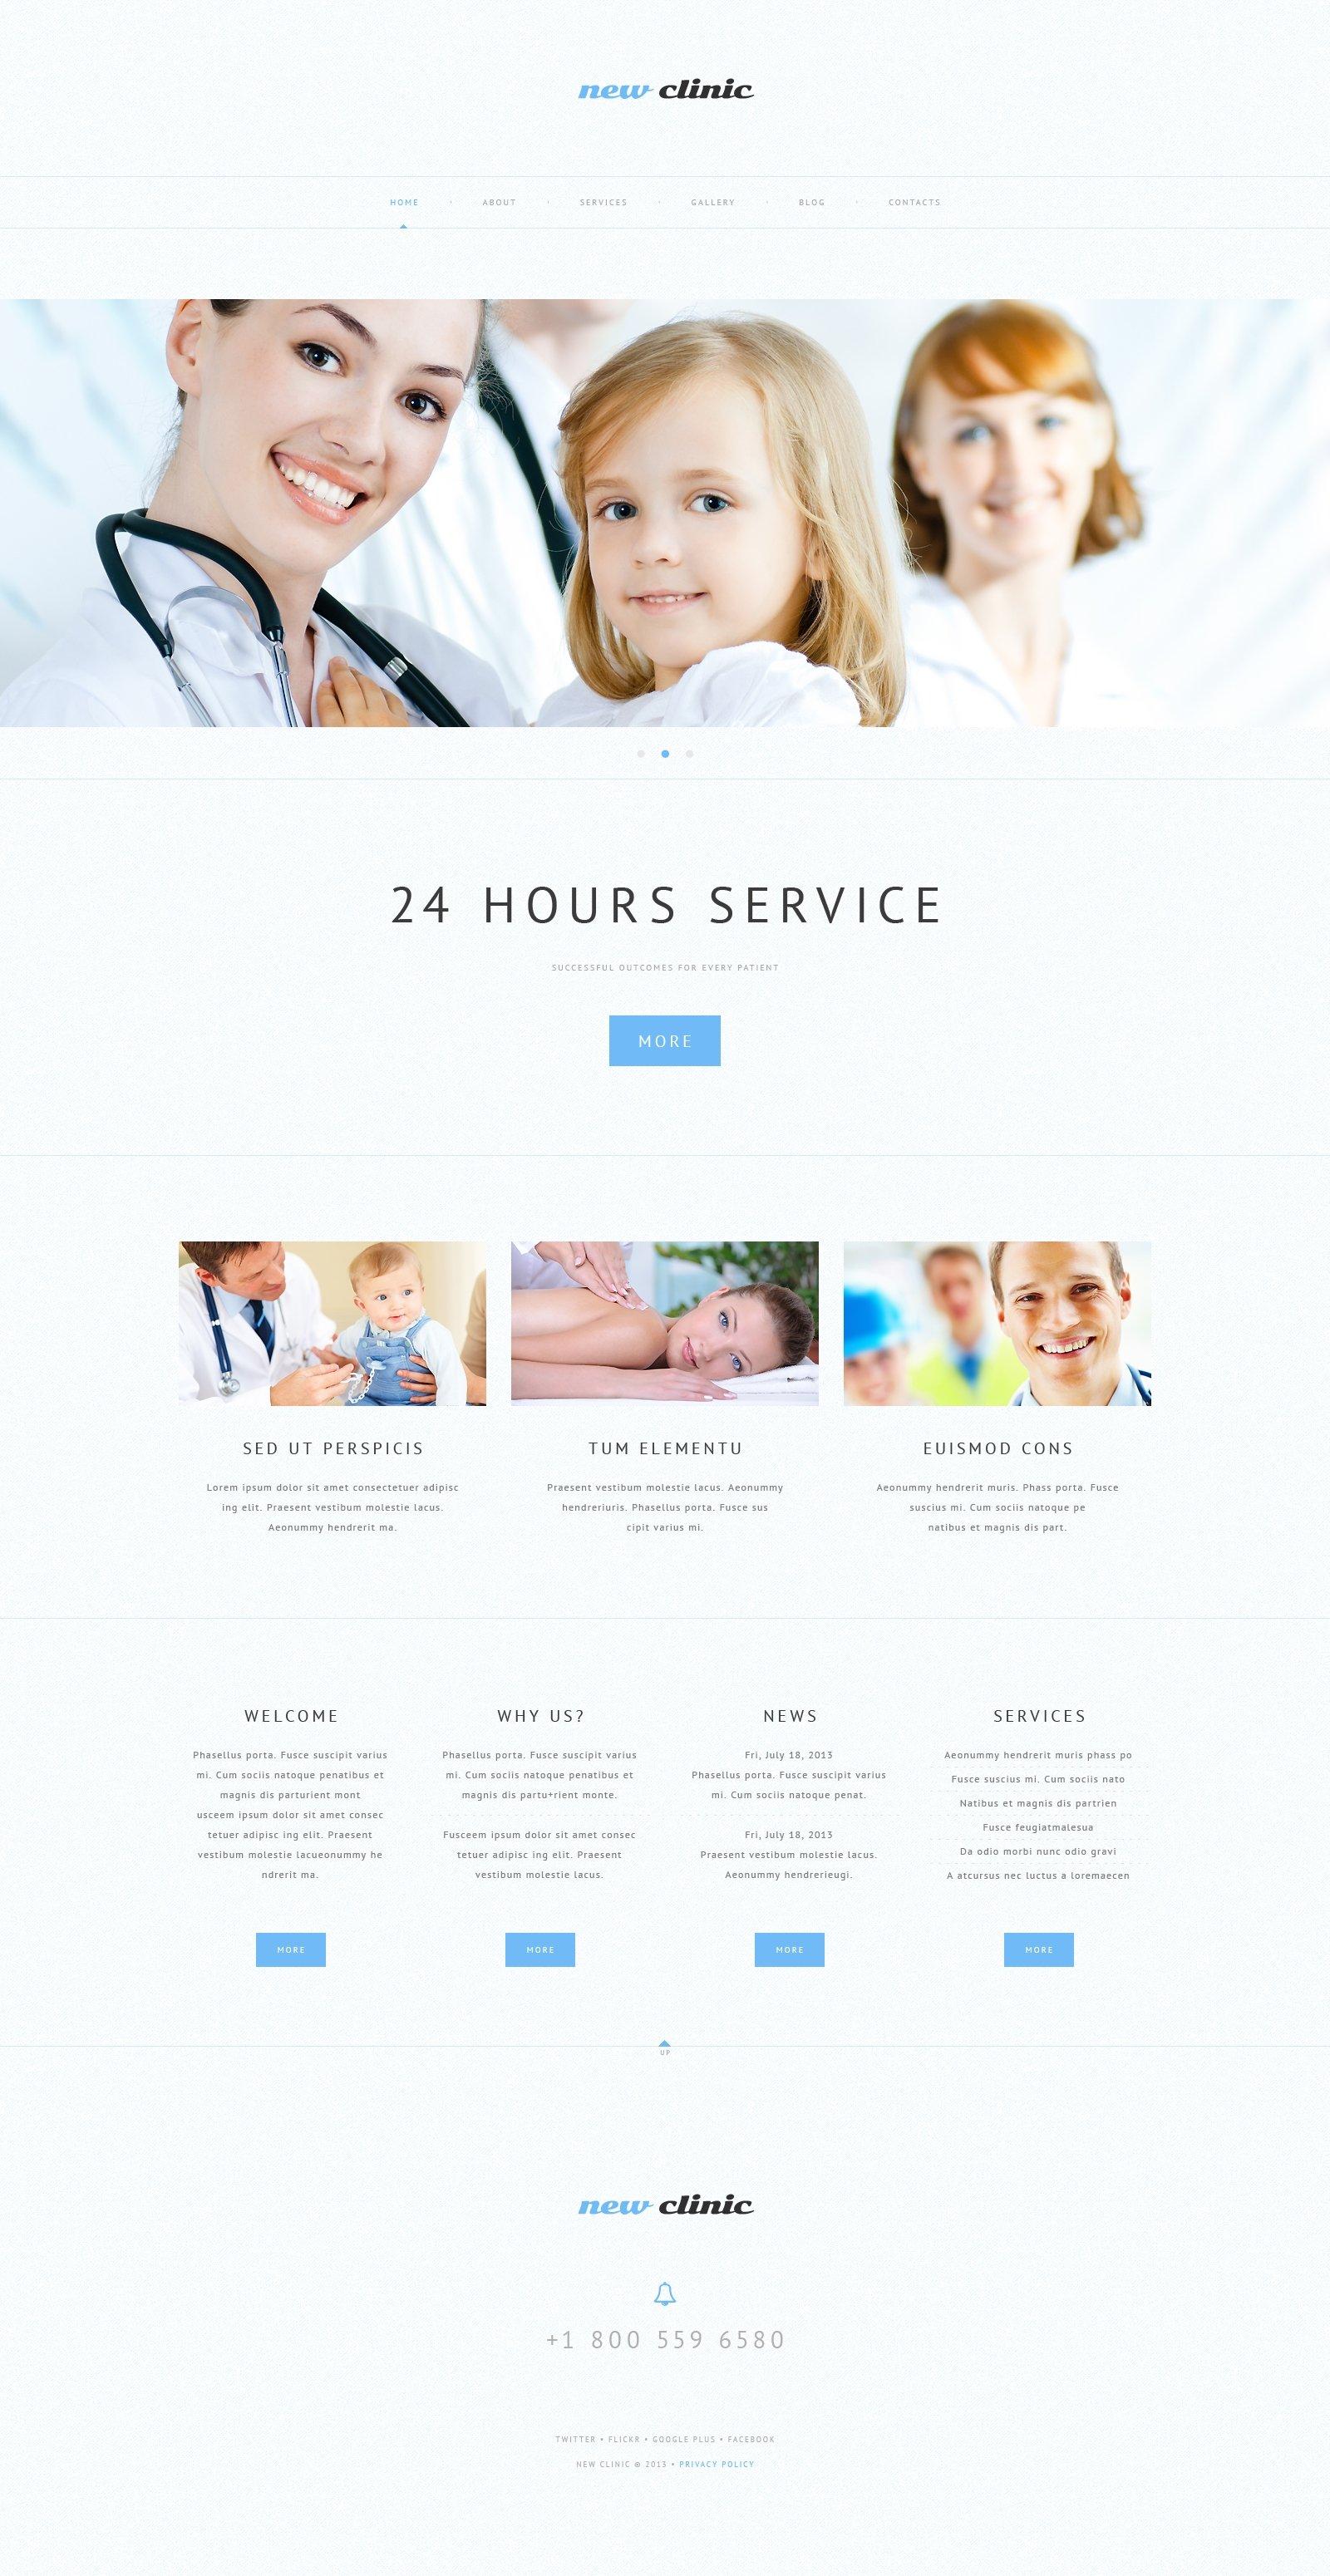 Thème WordPress adaptatif pour site médical #48978 - screenshot